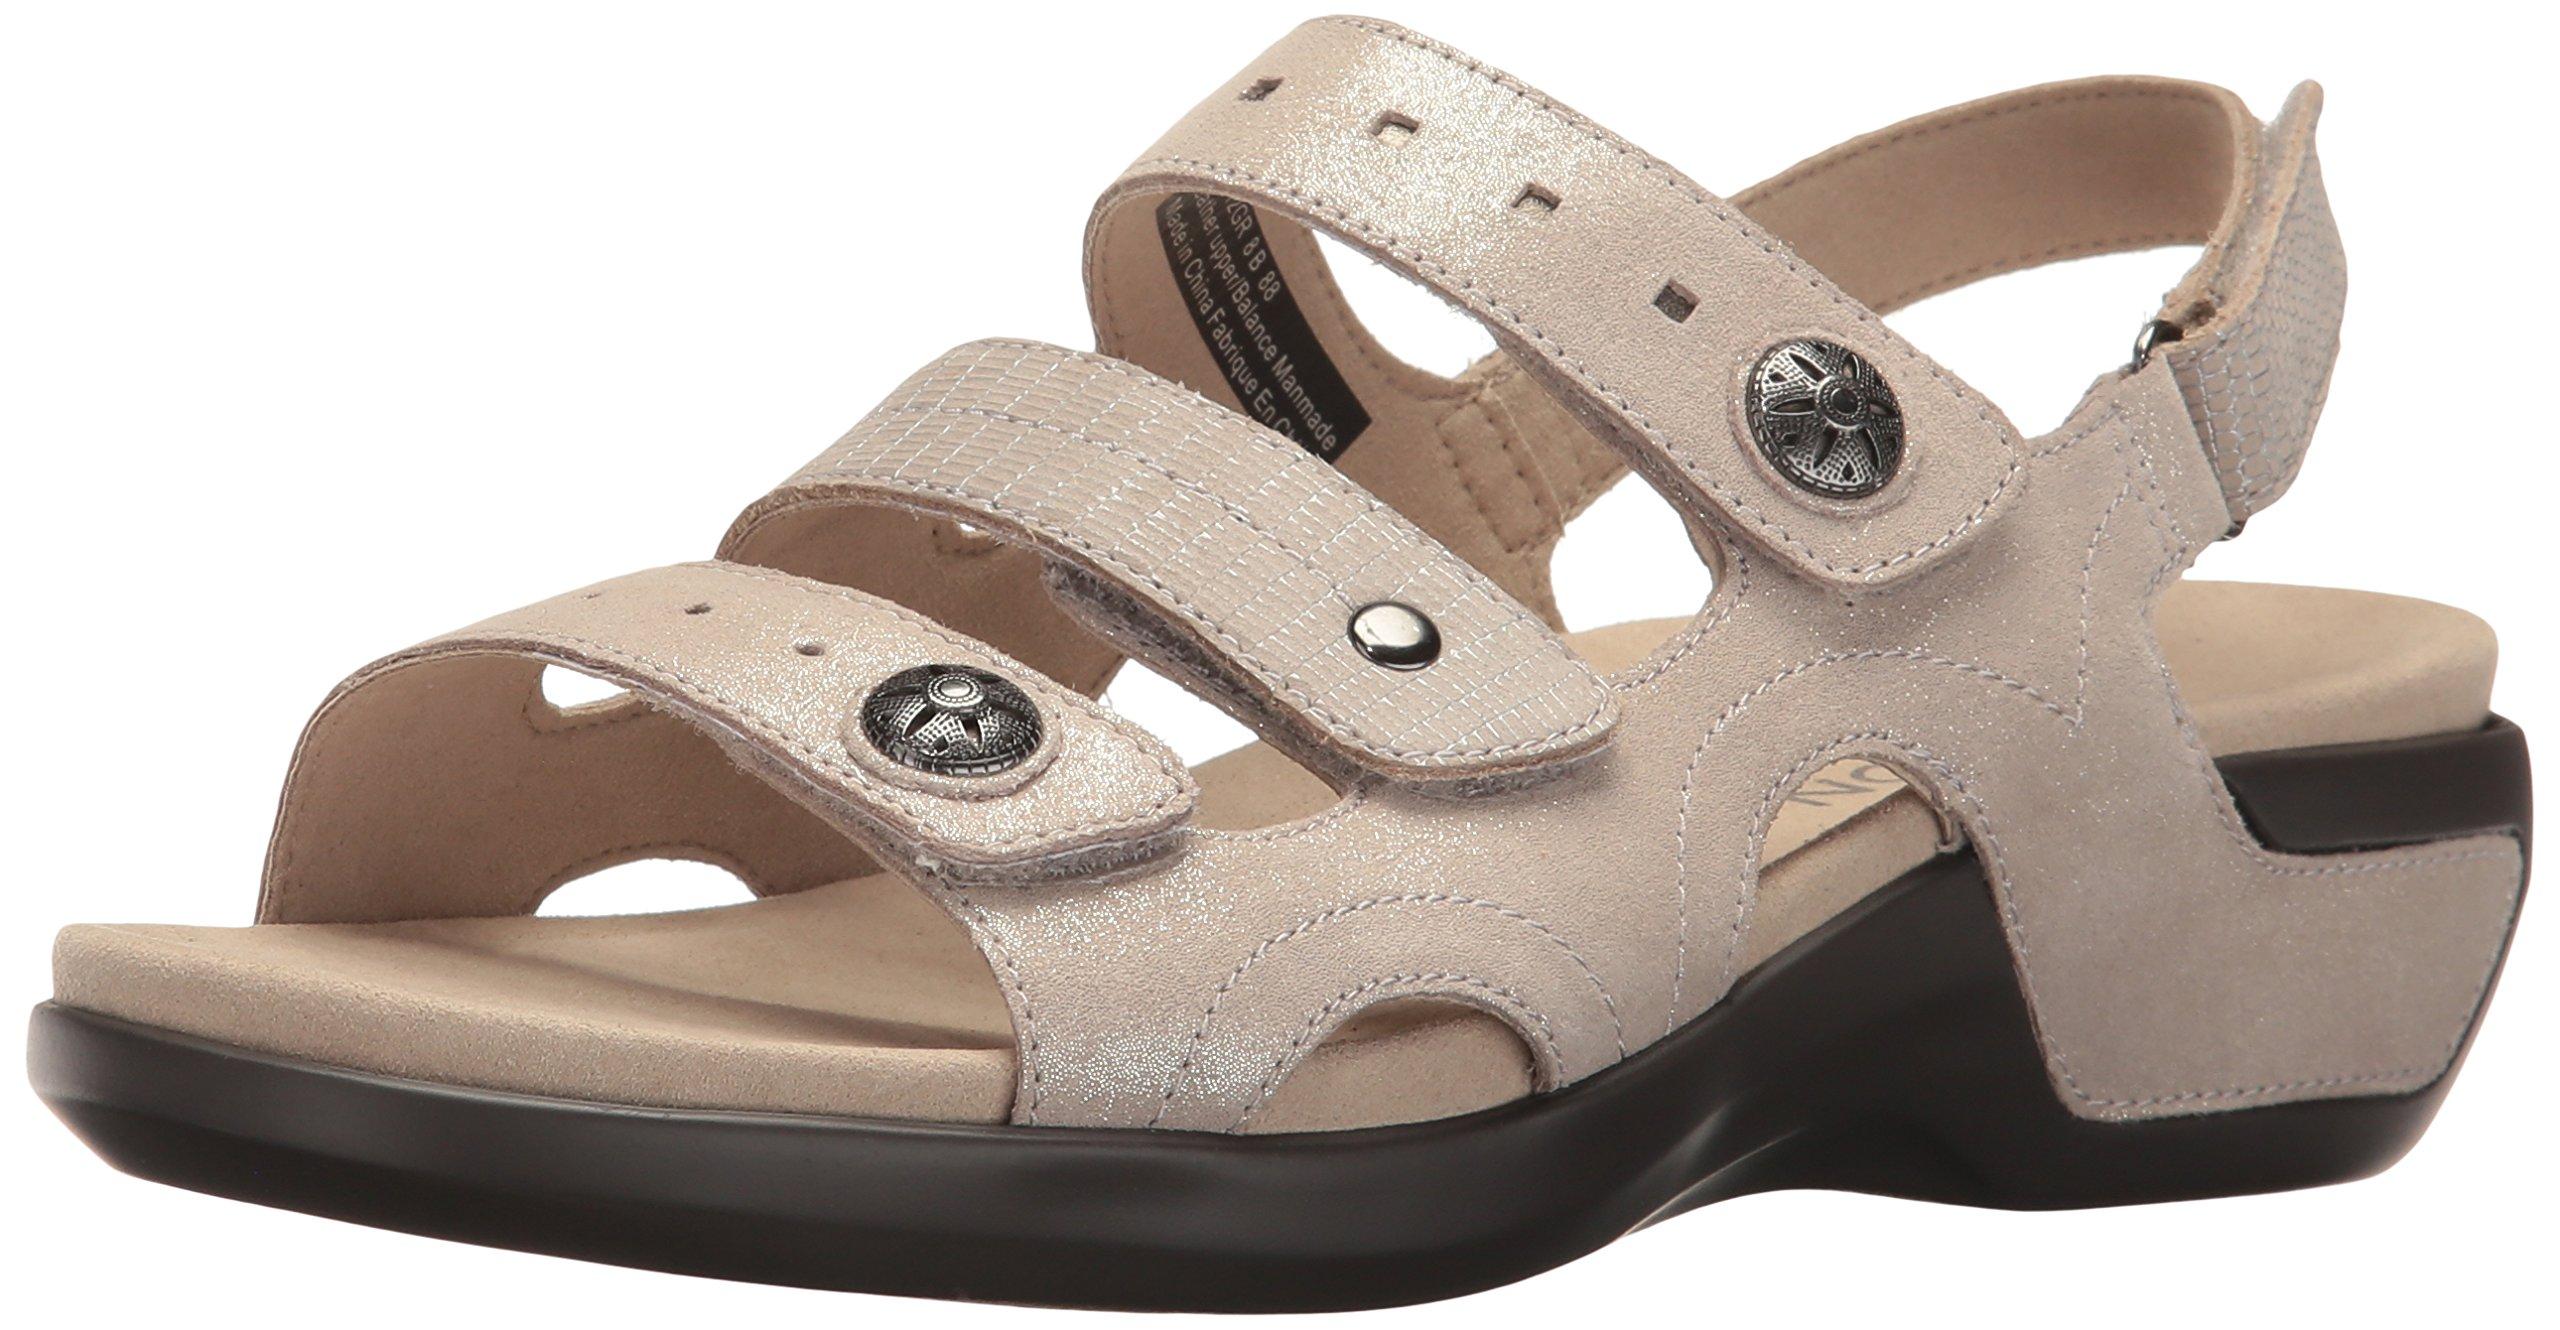 Aravon Women's Power Comfort Three Strap Heeled Sandal, Metallic Sand, 8 D US